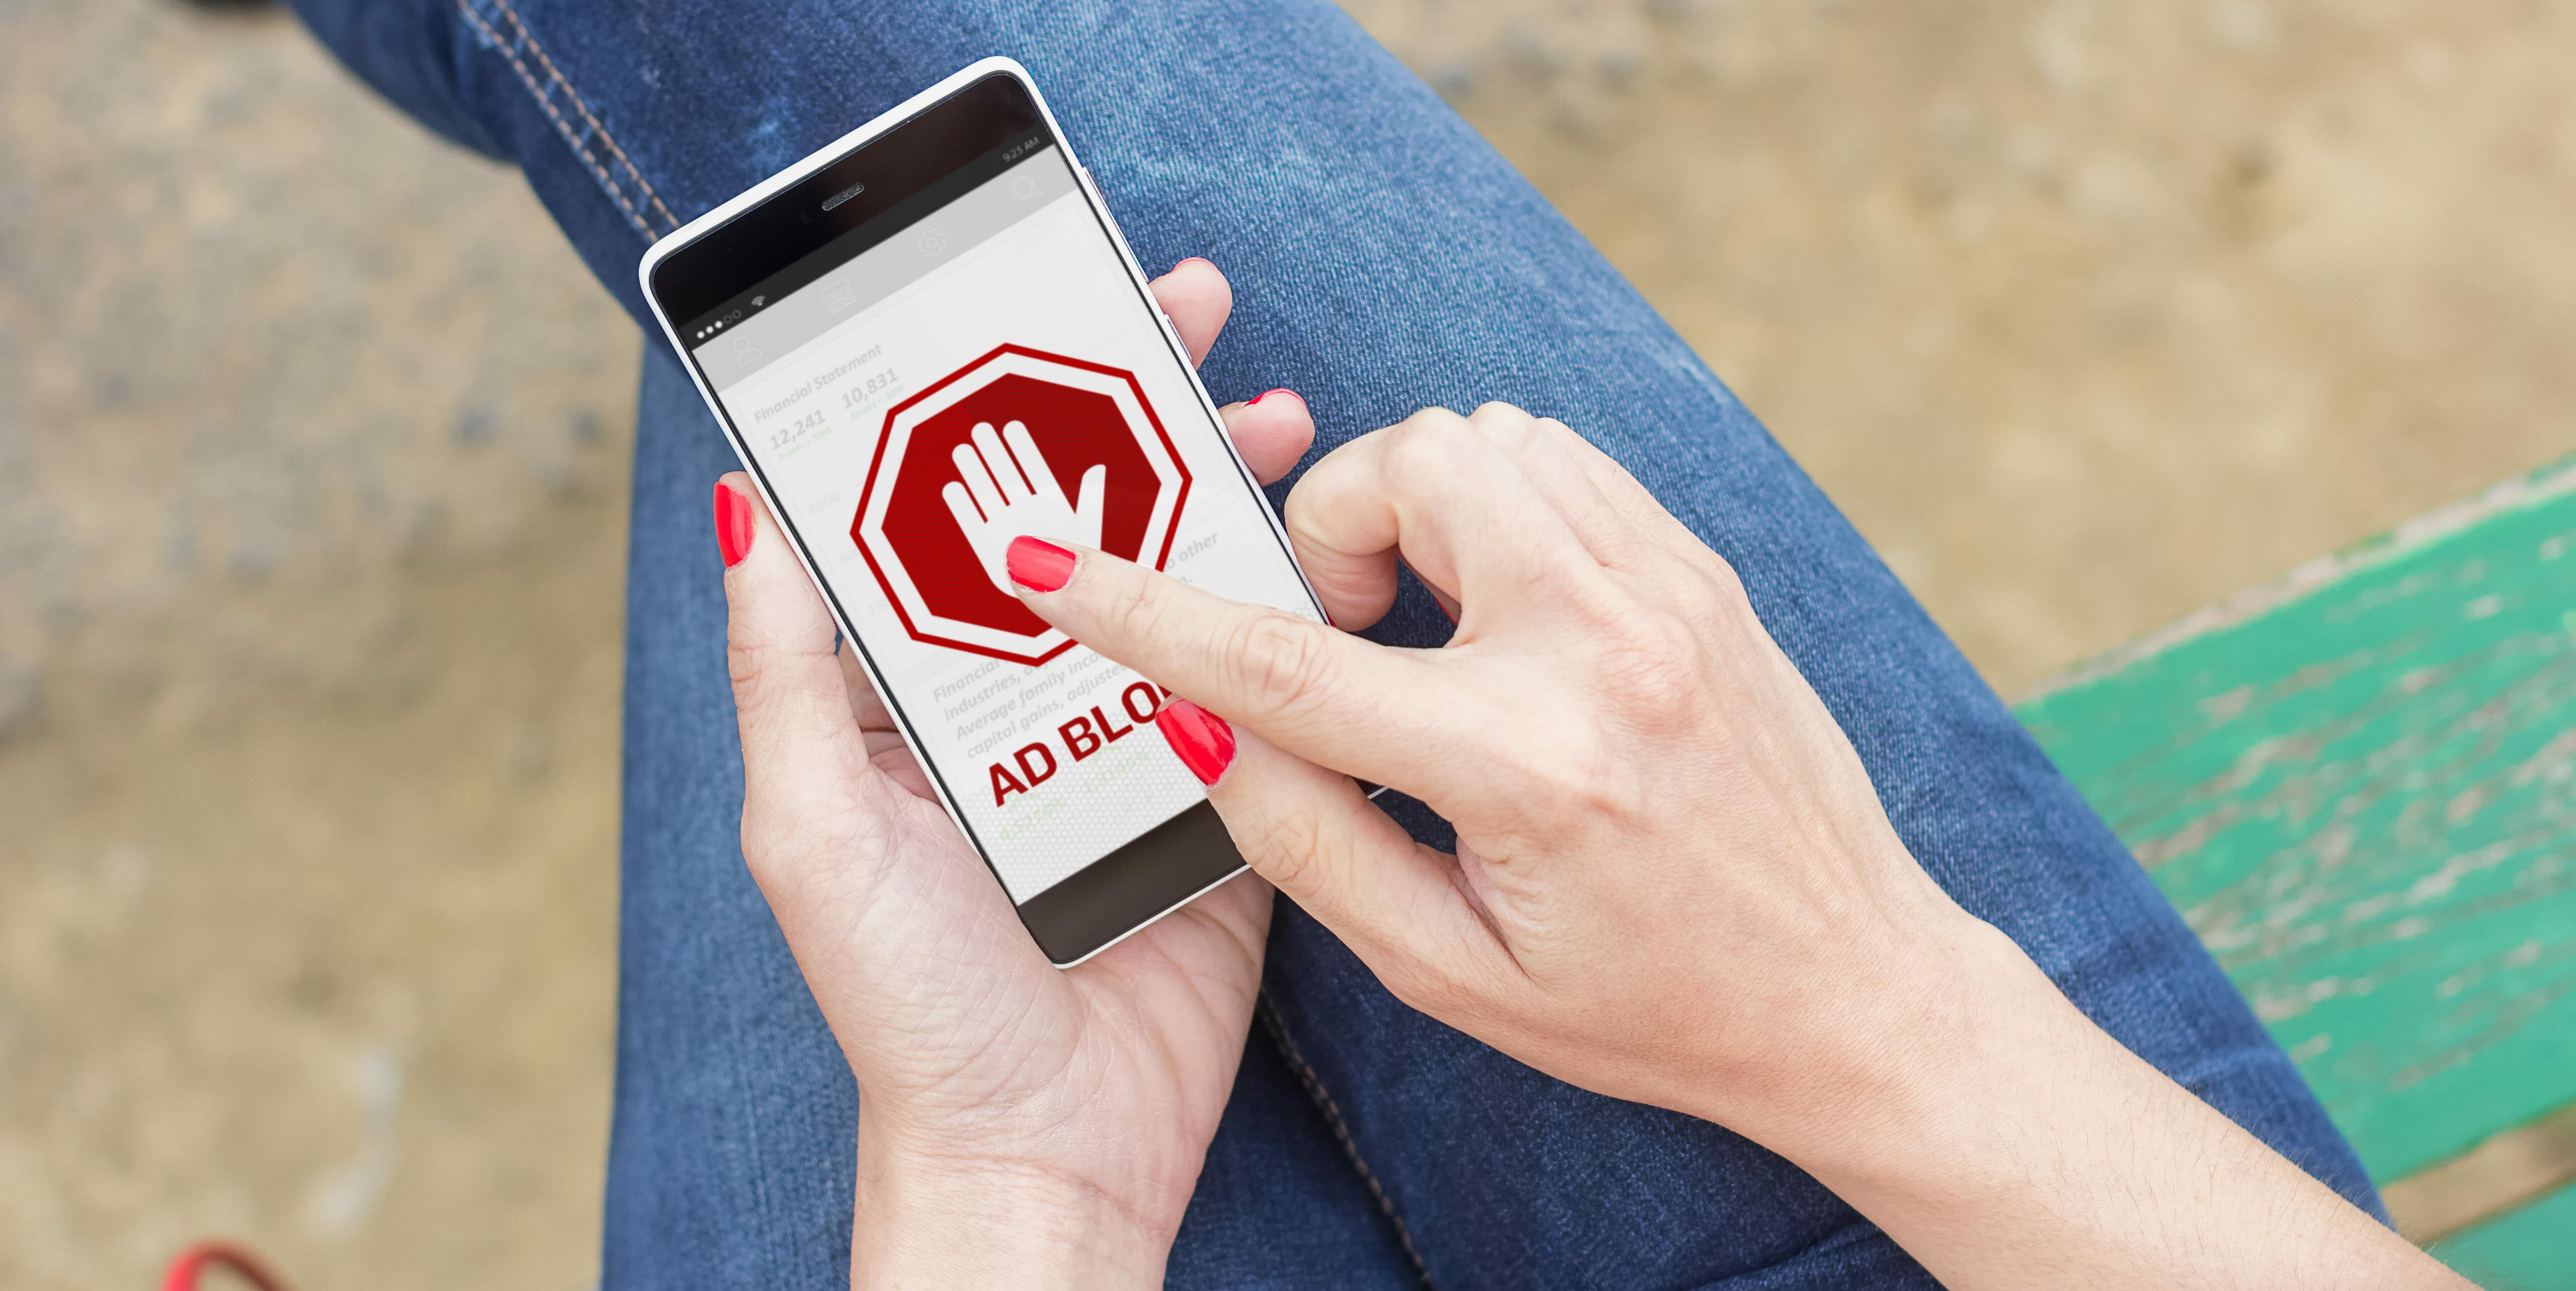 ad blocker mobile